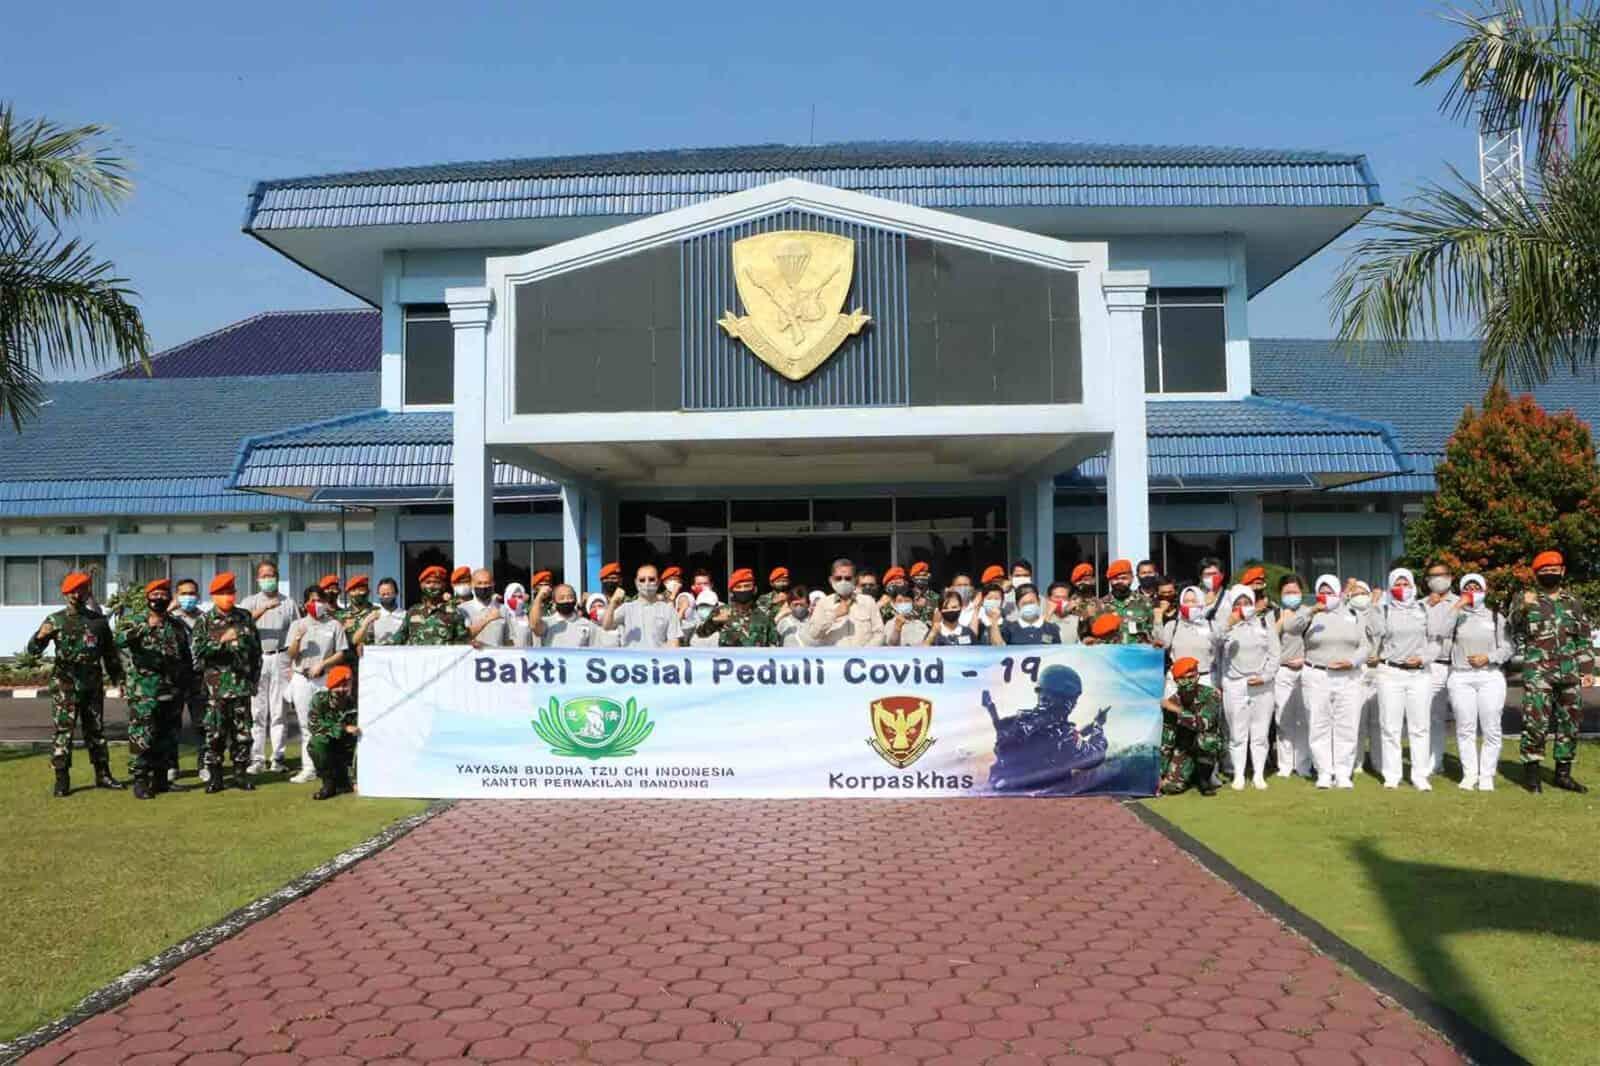 Korpaskhas Bersama Yayasan Buddha Tzu Chi Bagikan Paket Sembako